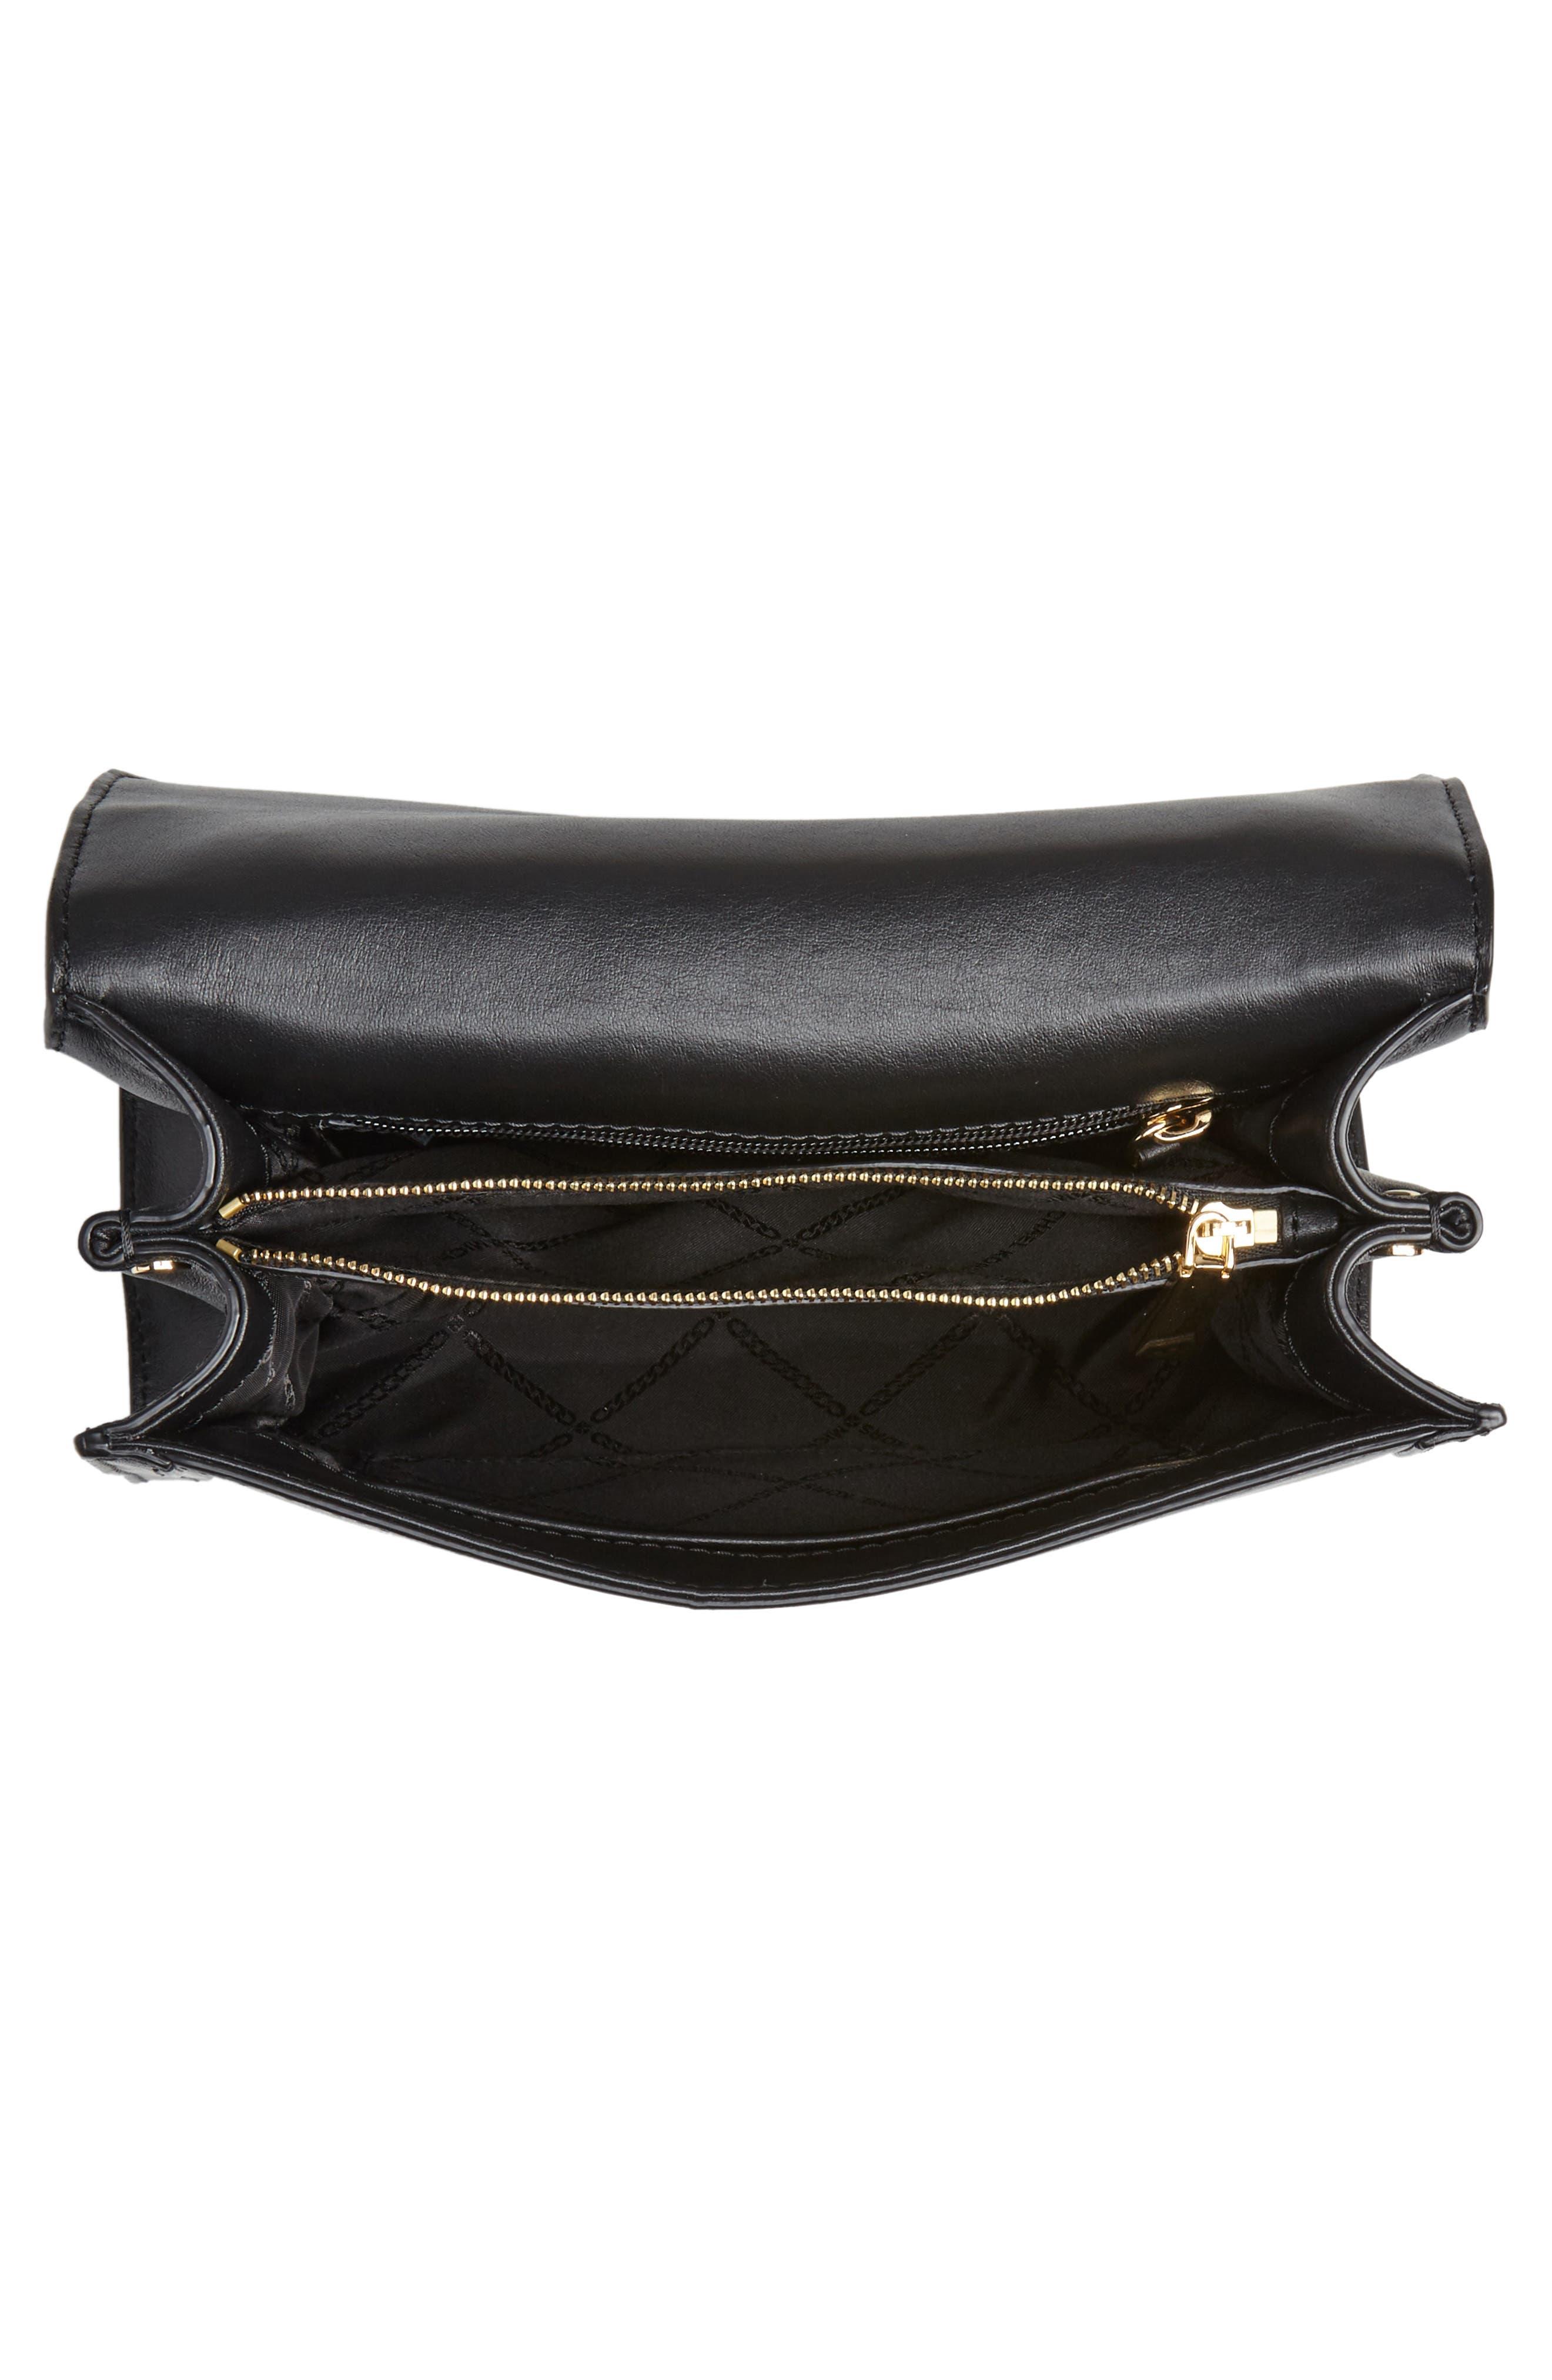 MICHAEL MICHAEL KORS,                             Large Whitney Leather Shoulder Bag,                             Alternate thumbnail 4, color,                             BLACK